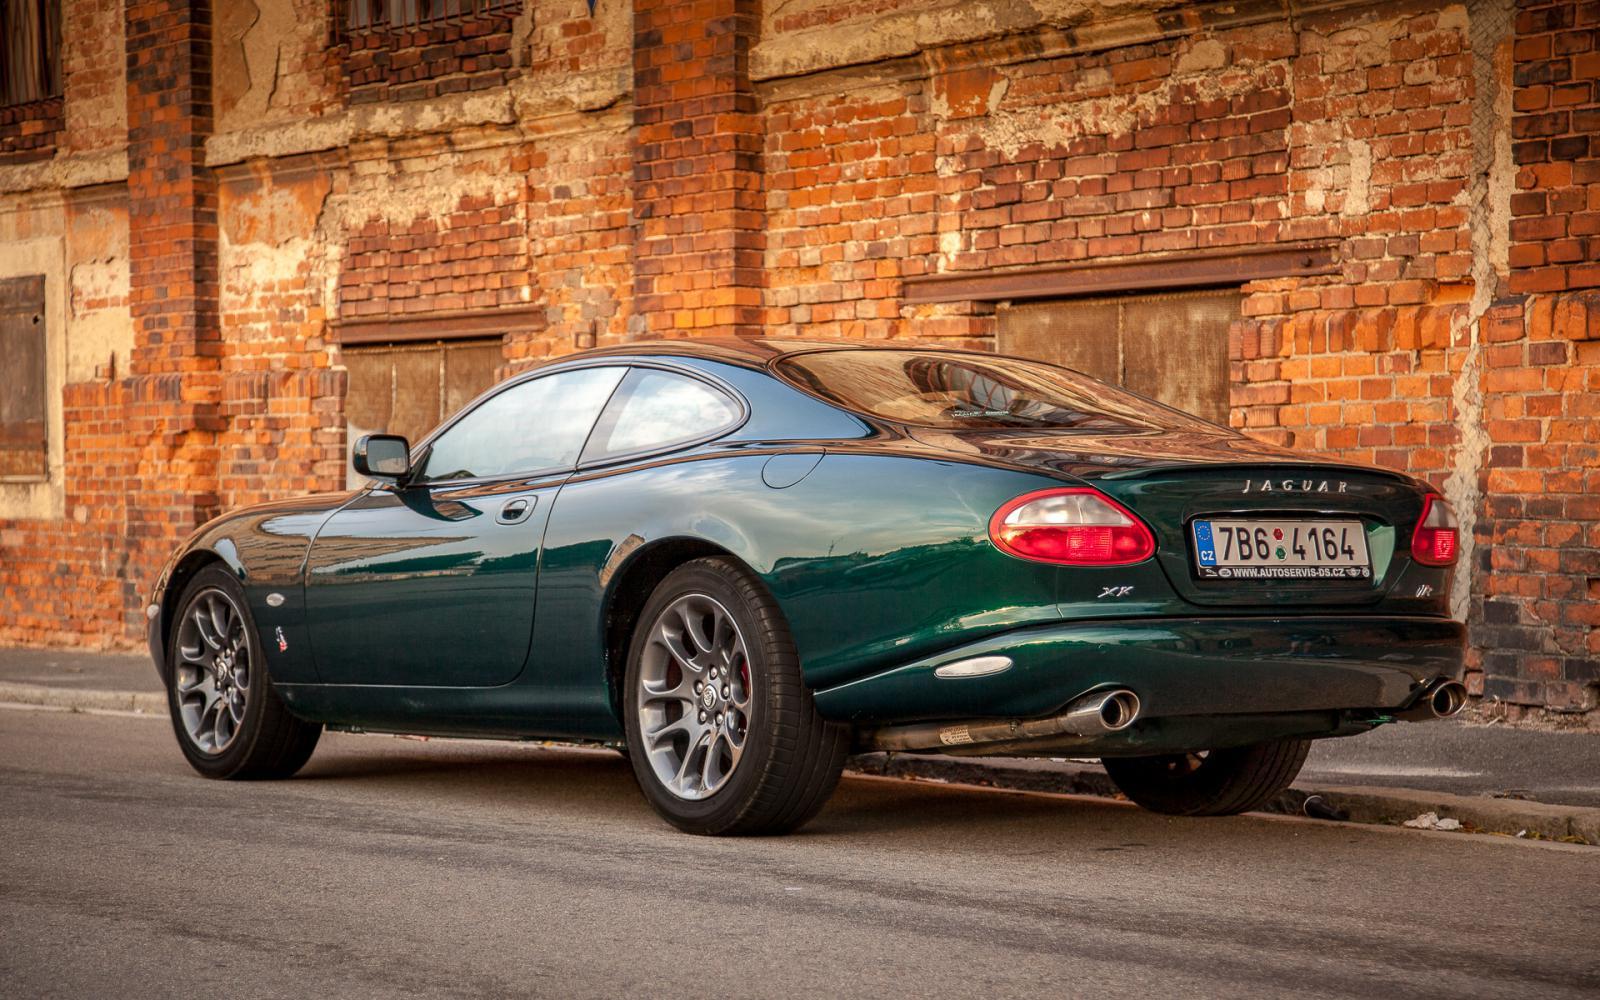 1999 Jaguar XK-X100 XKR 4.0 V8 benzín 267 kW 525 Nm